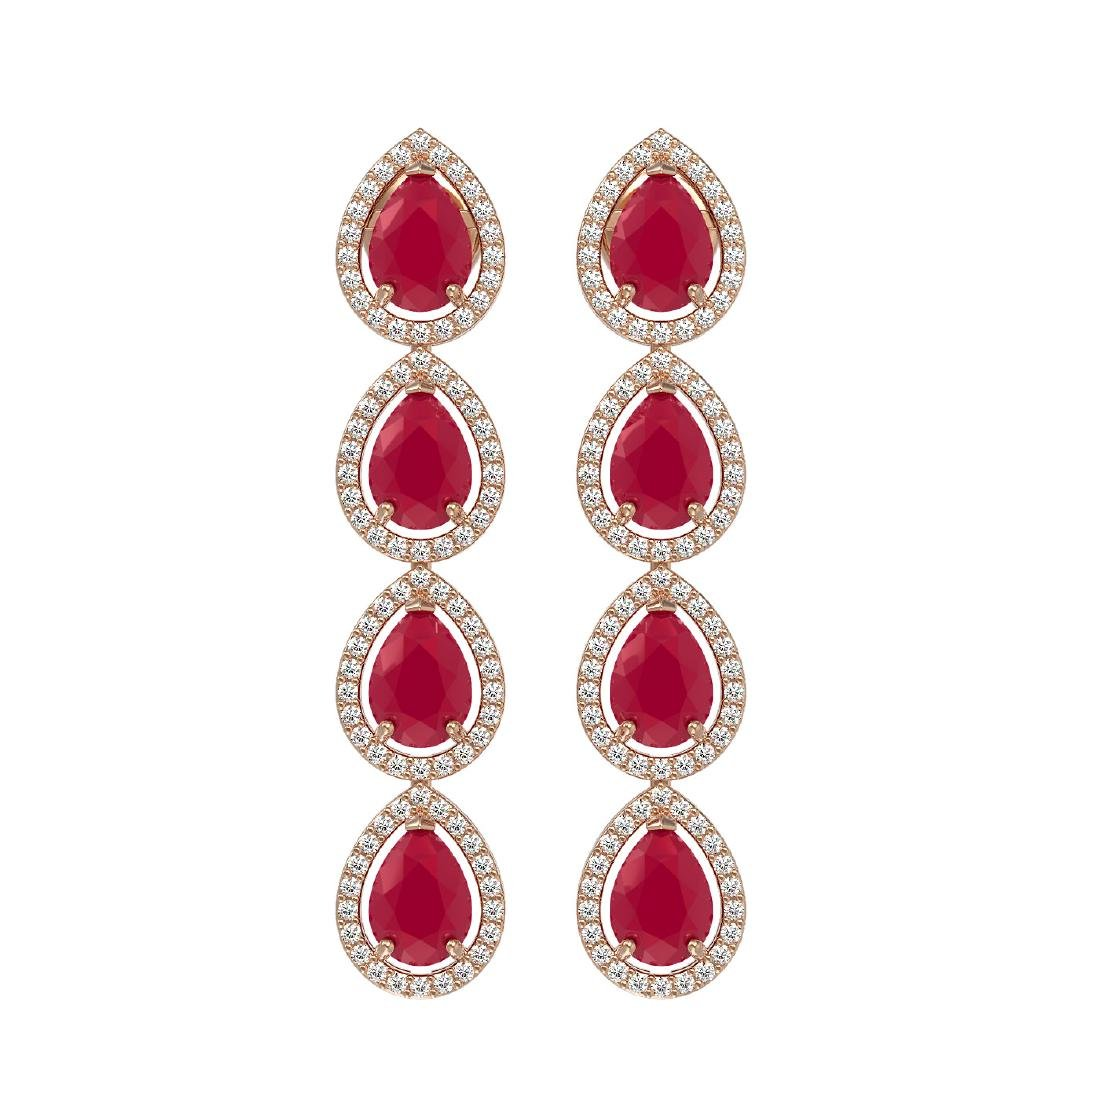 10.2 CTW Ruby & Diamond Halo Earrings 10K Rose Gold